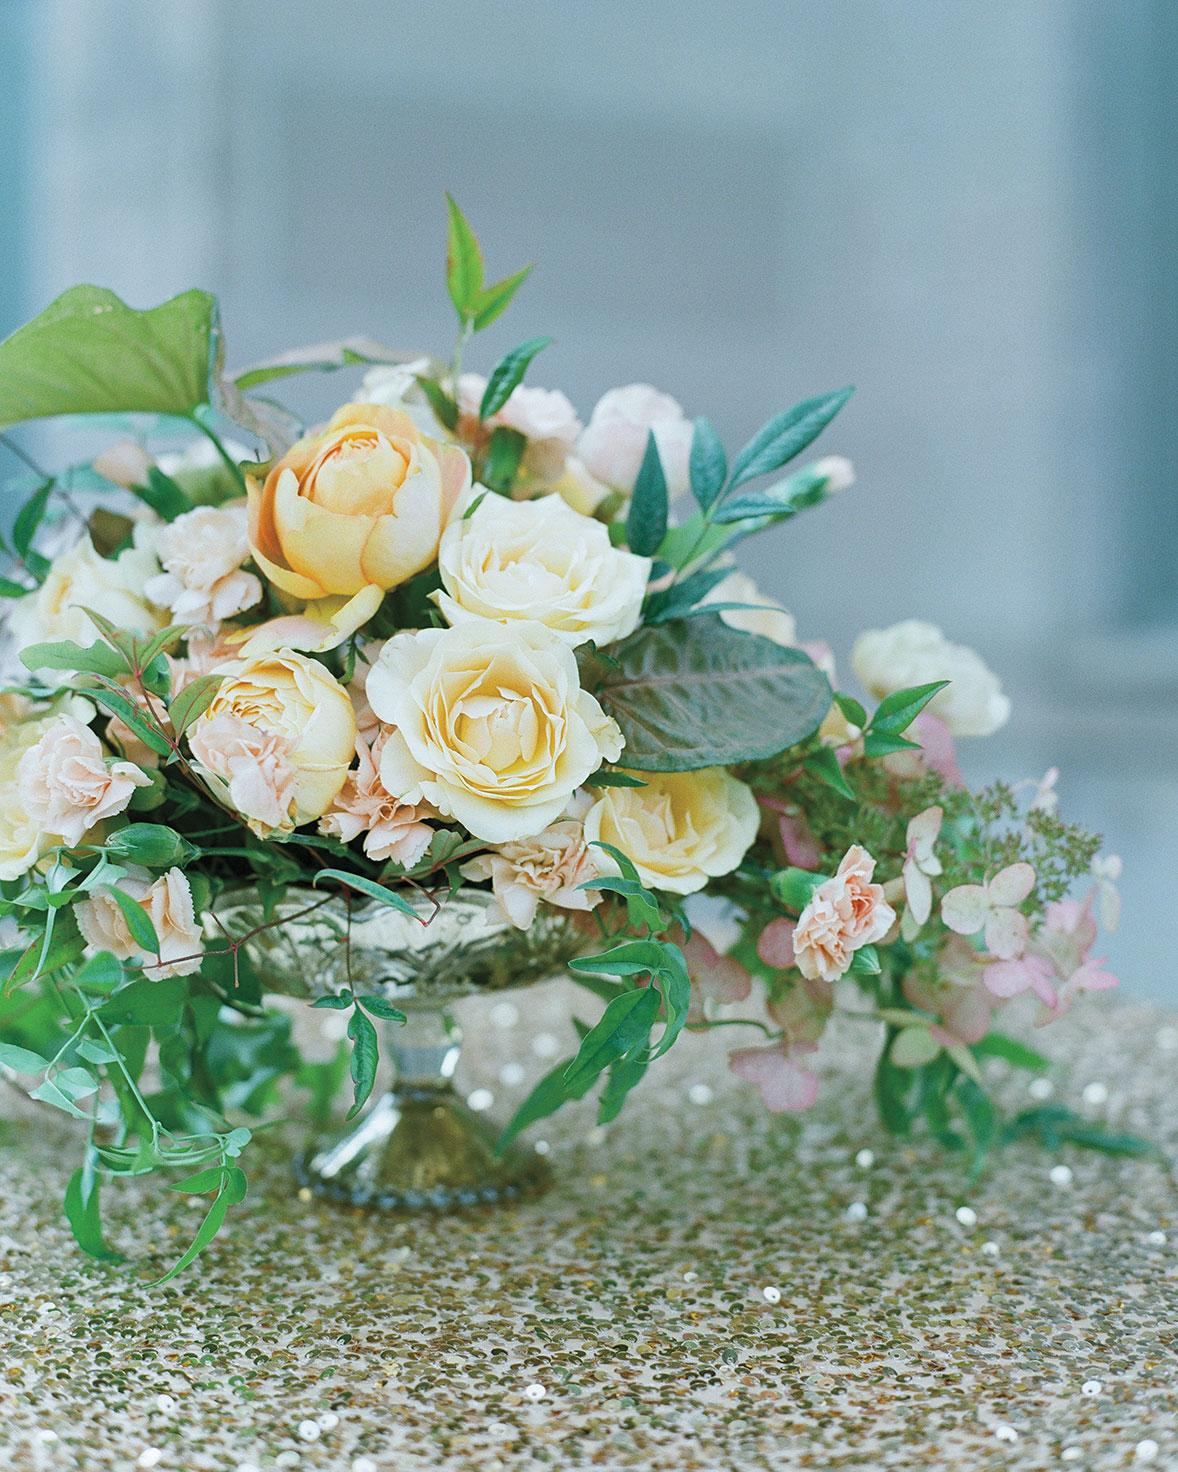 adrienne-jason-wedding-minnesota-floral-arrangement-0045-s111925.jpg